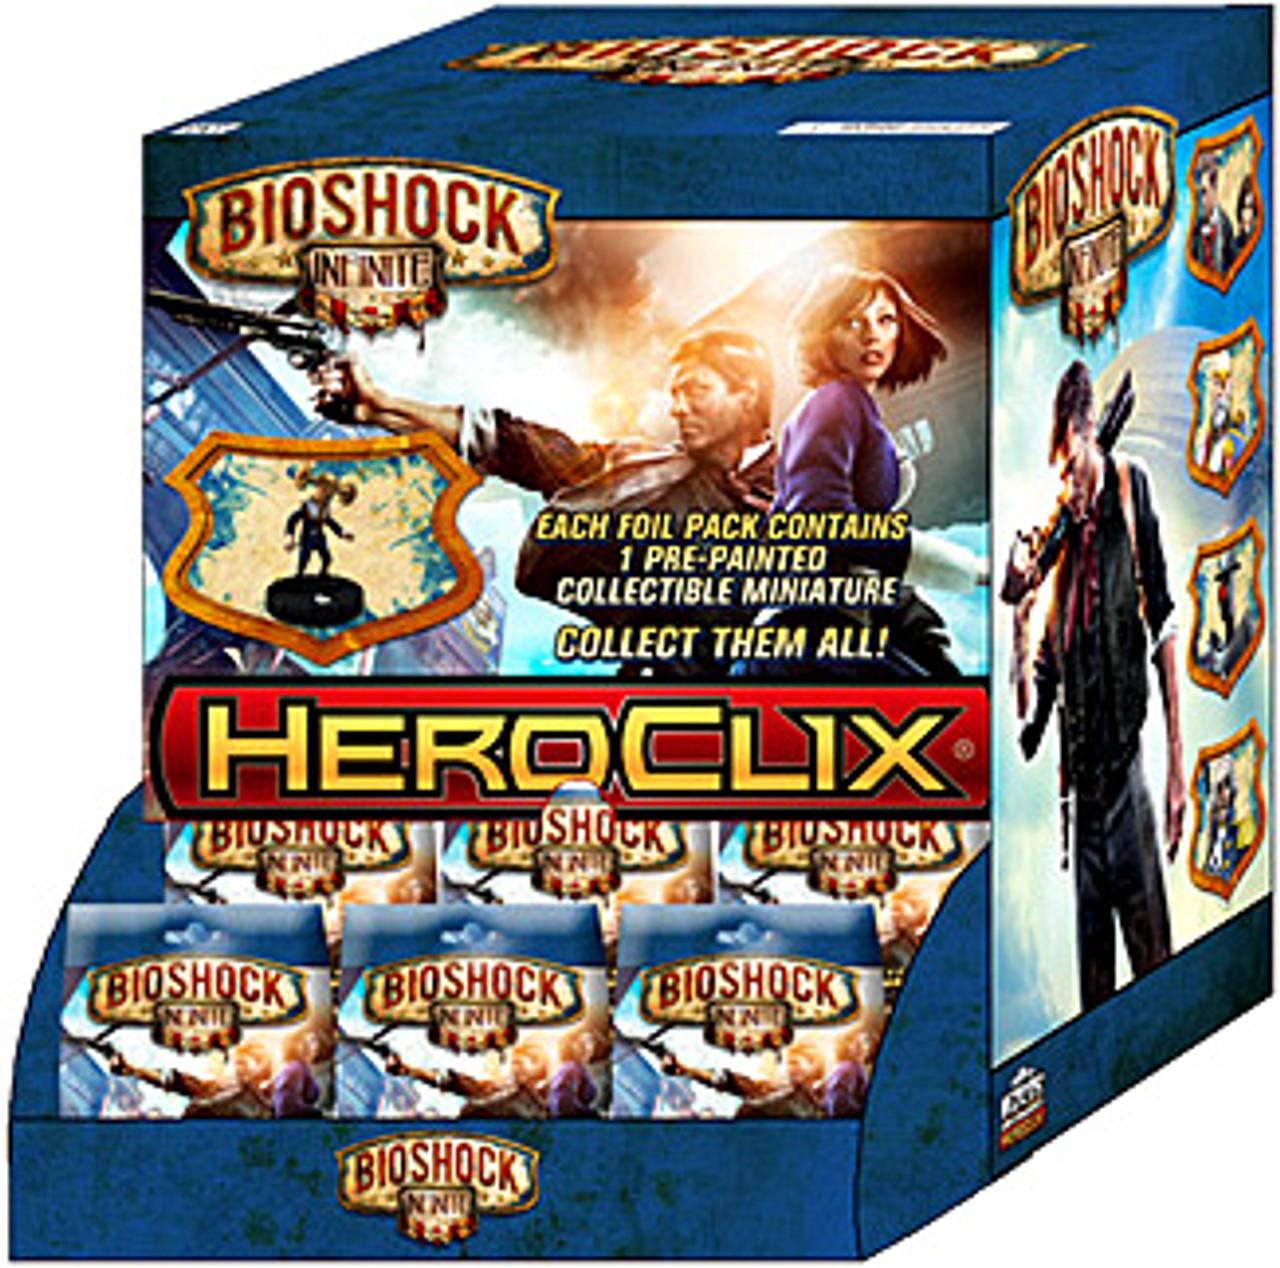 HeroClix Bioshock Infinite Booster Box